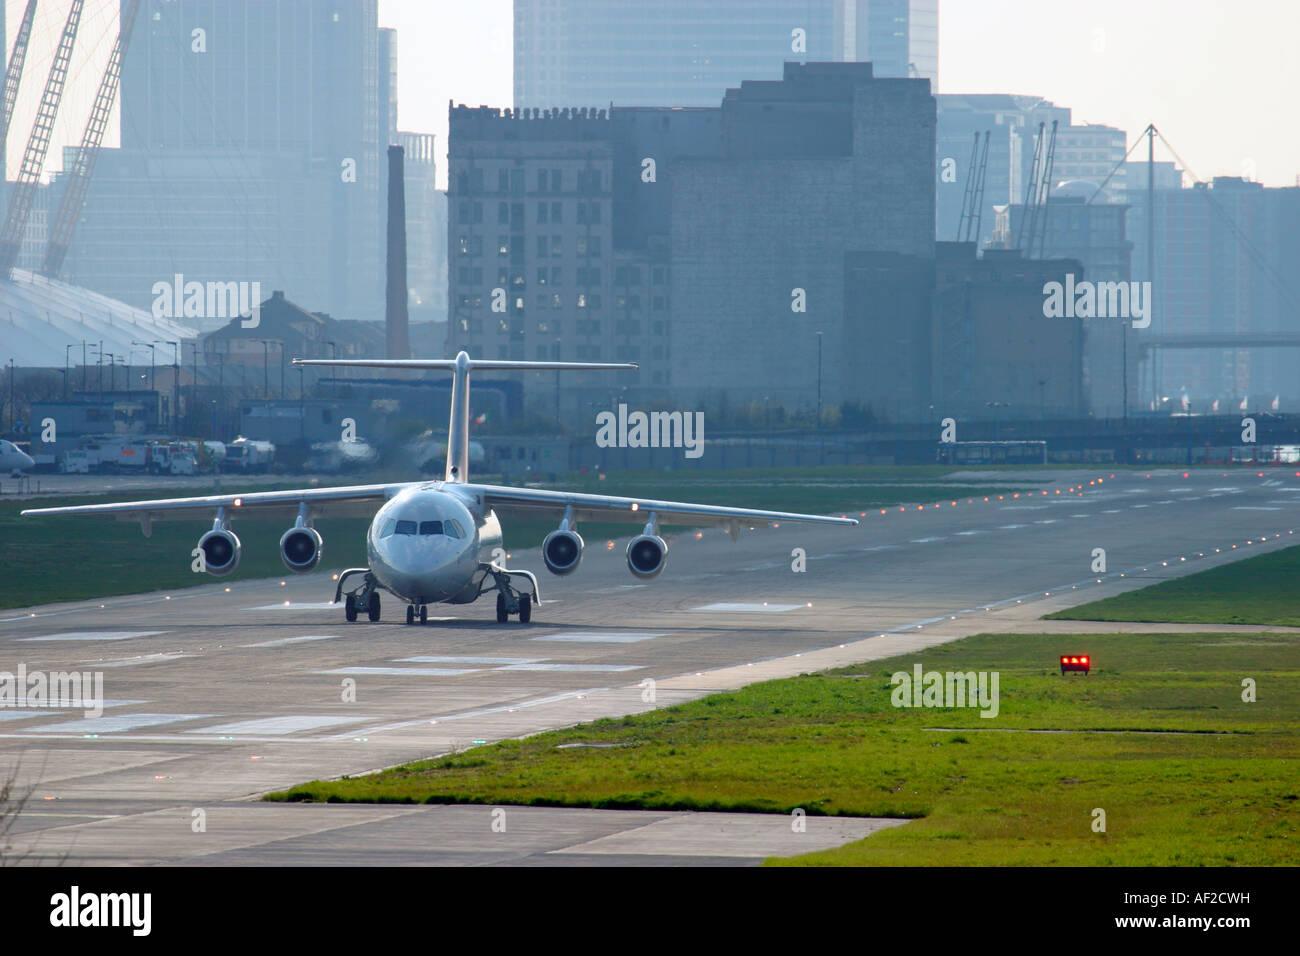 Regional plane jet on runway - Stock Image